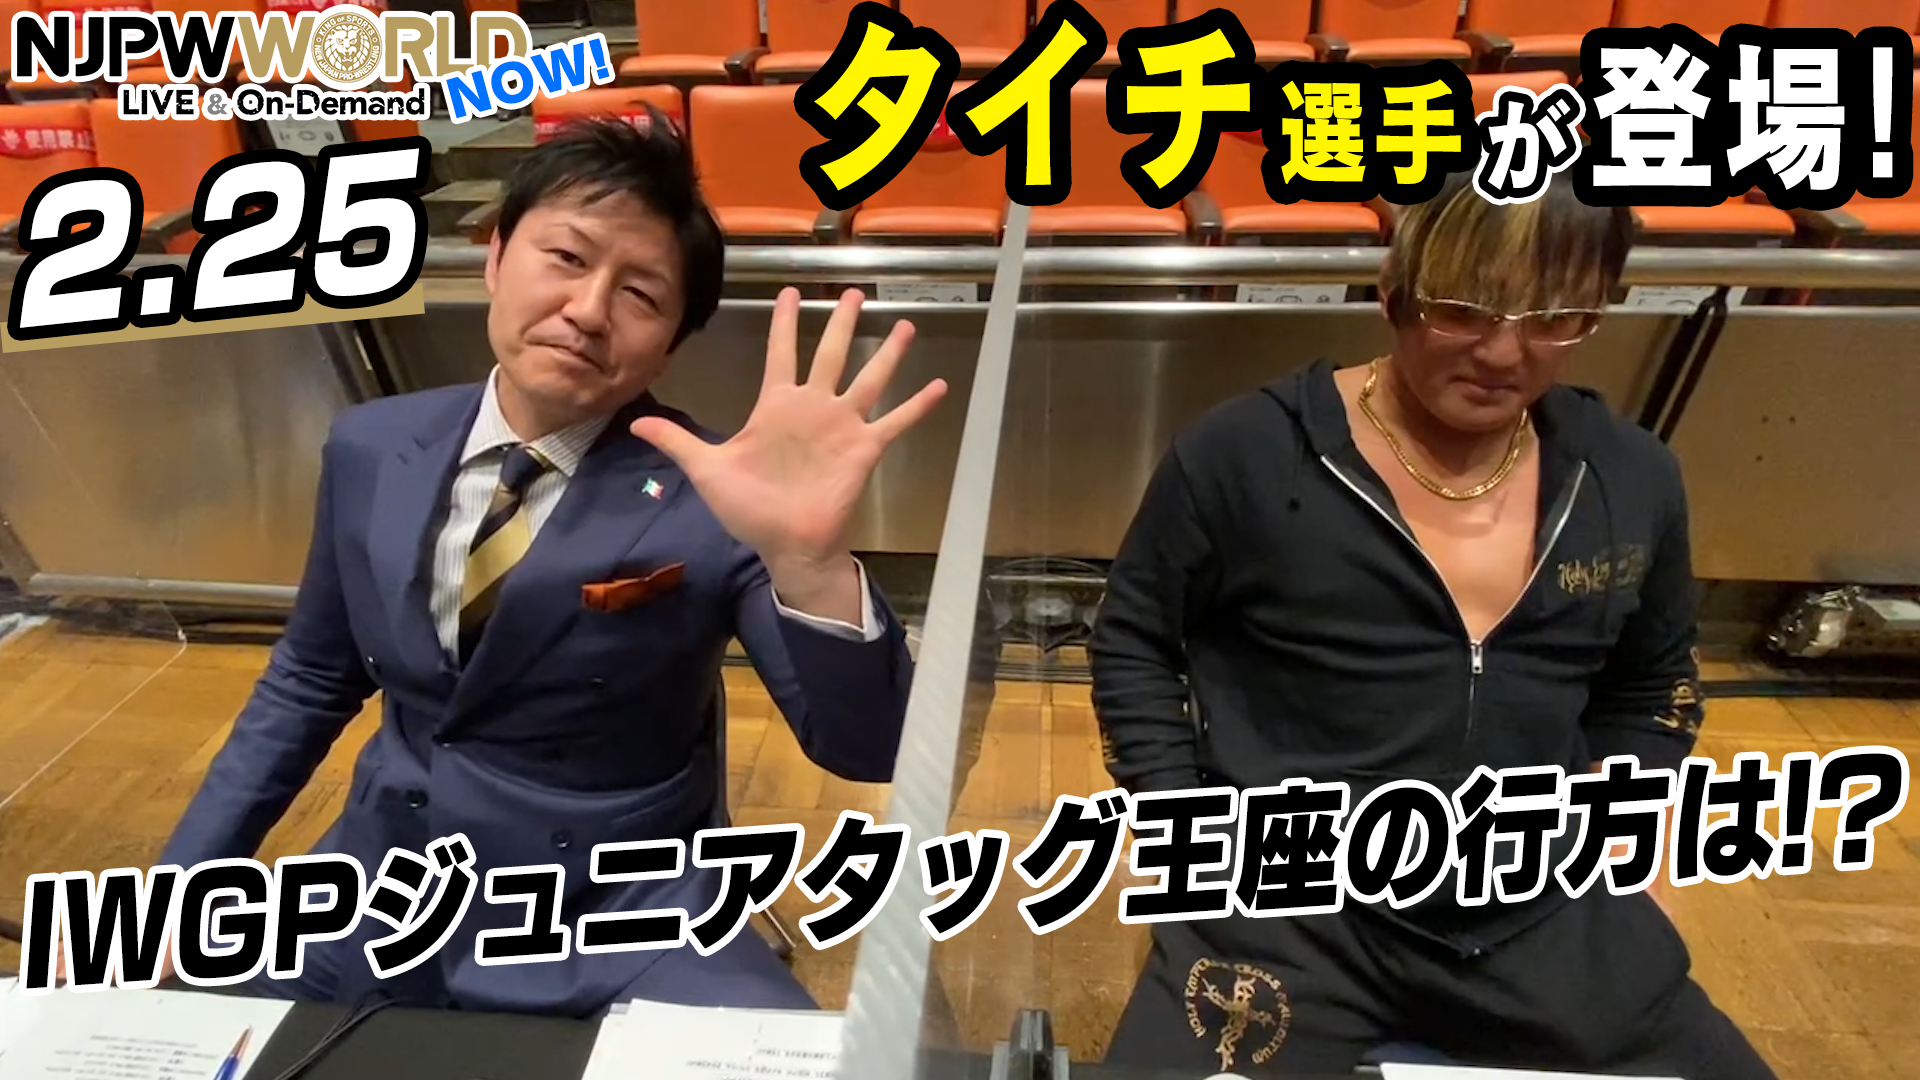 IWGPジュニアタッグ王座の行方は⁉️タイチ選手と後楽園大会を振り返る‼️ NJPWWORLD NOW!